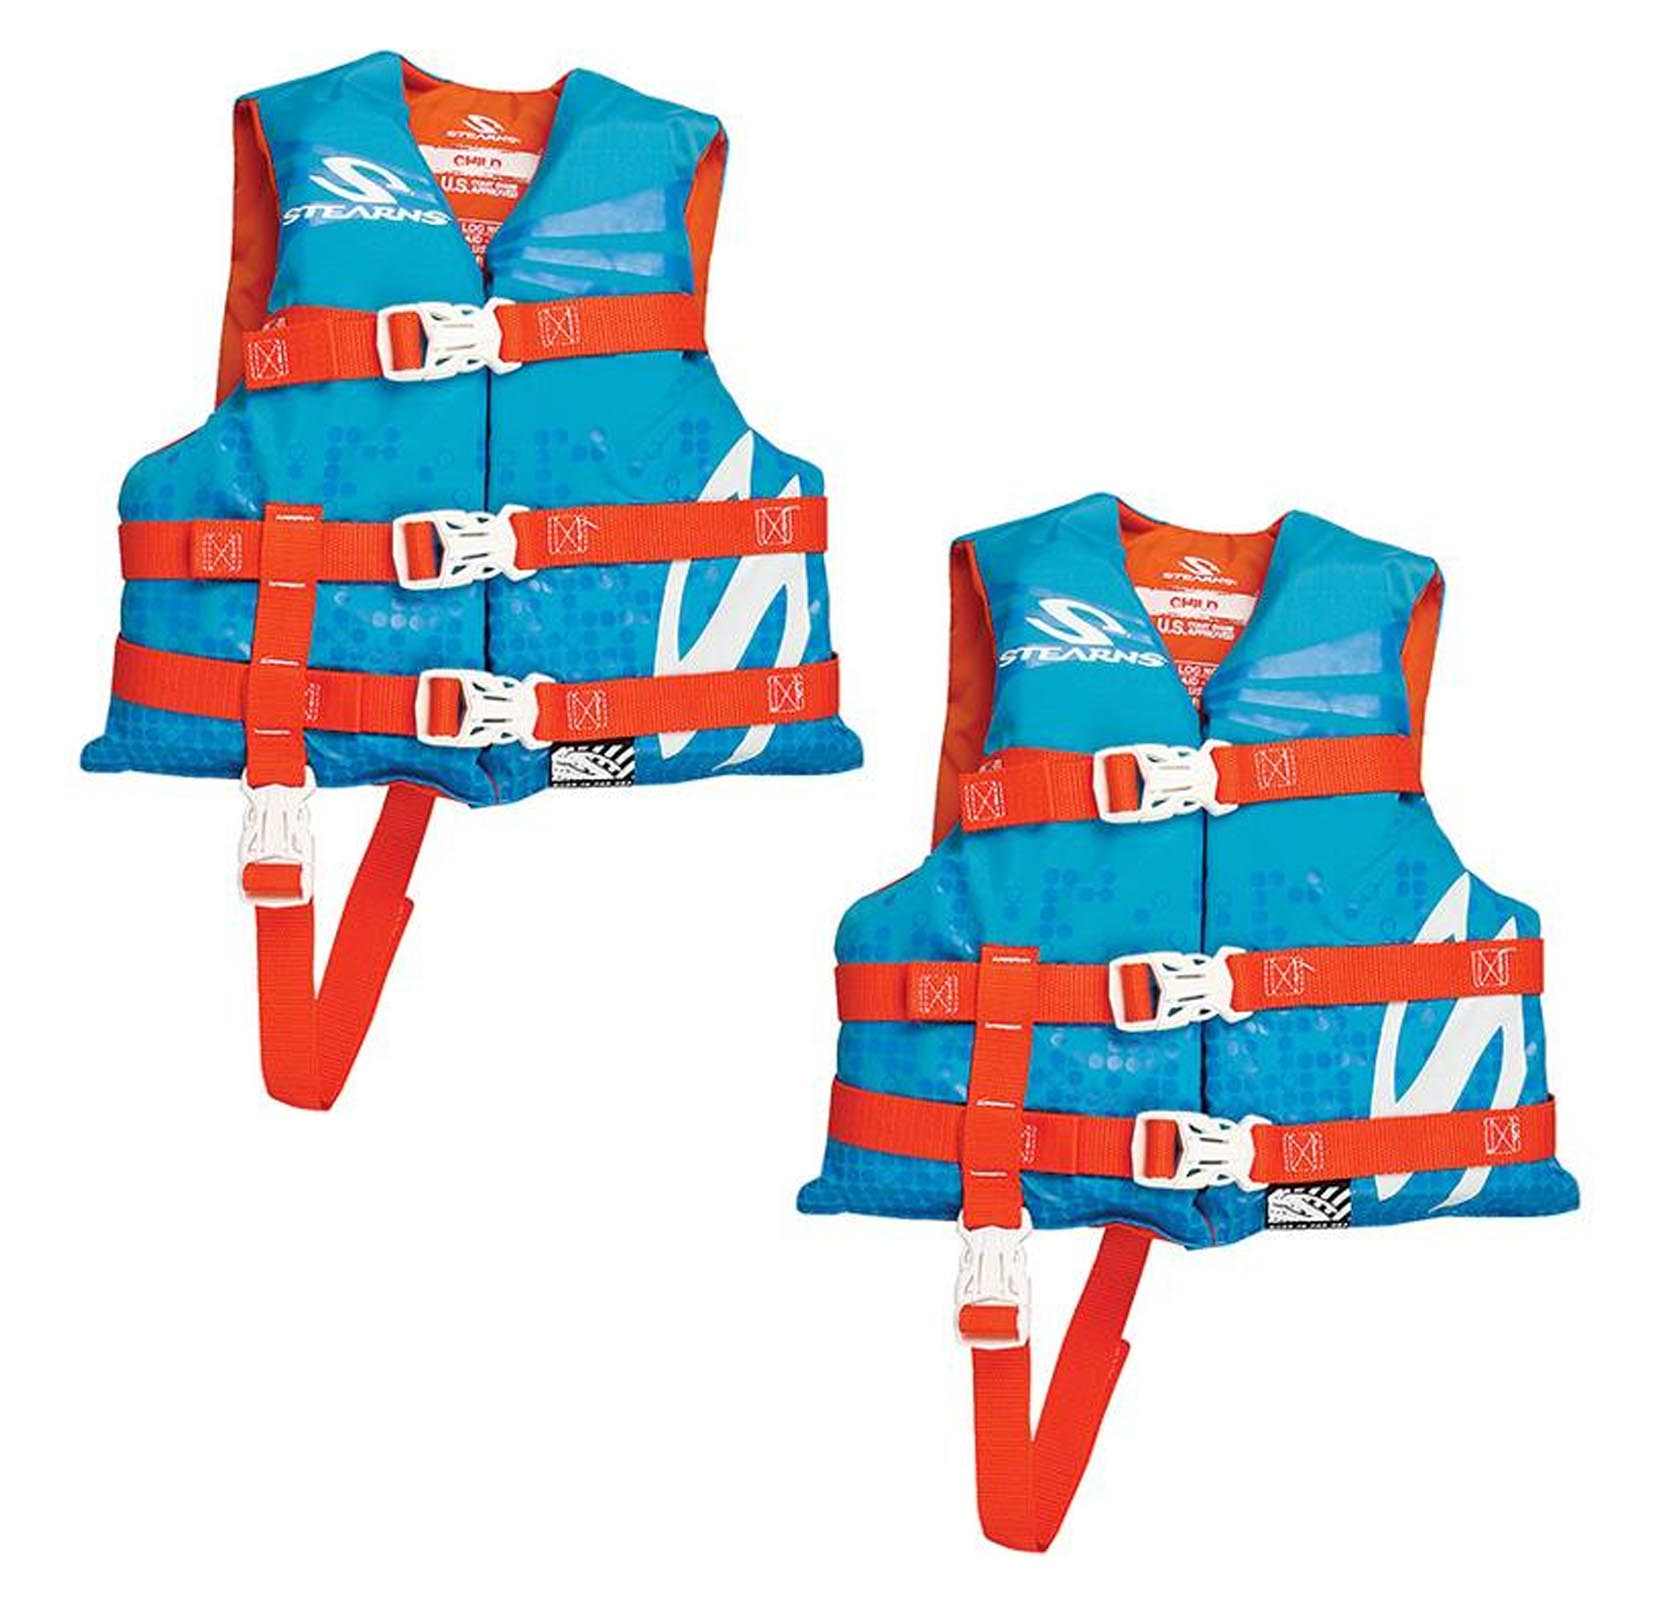 Stearns Child Nylon Life Vest, Blue/Red